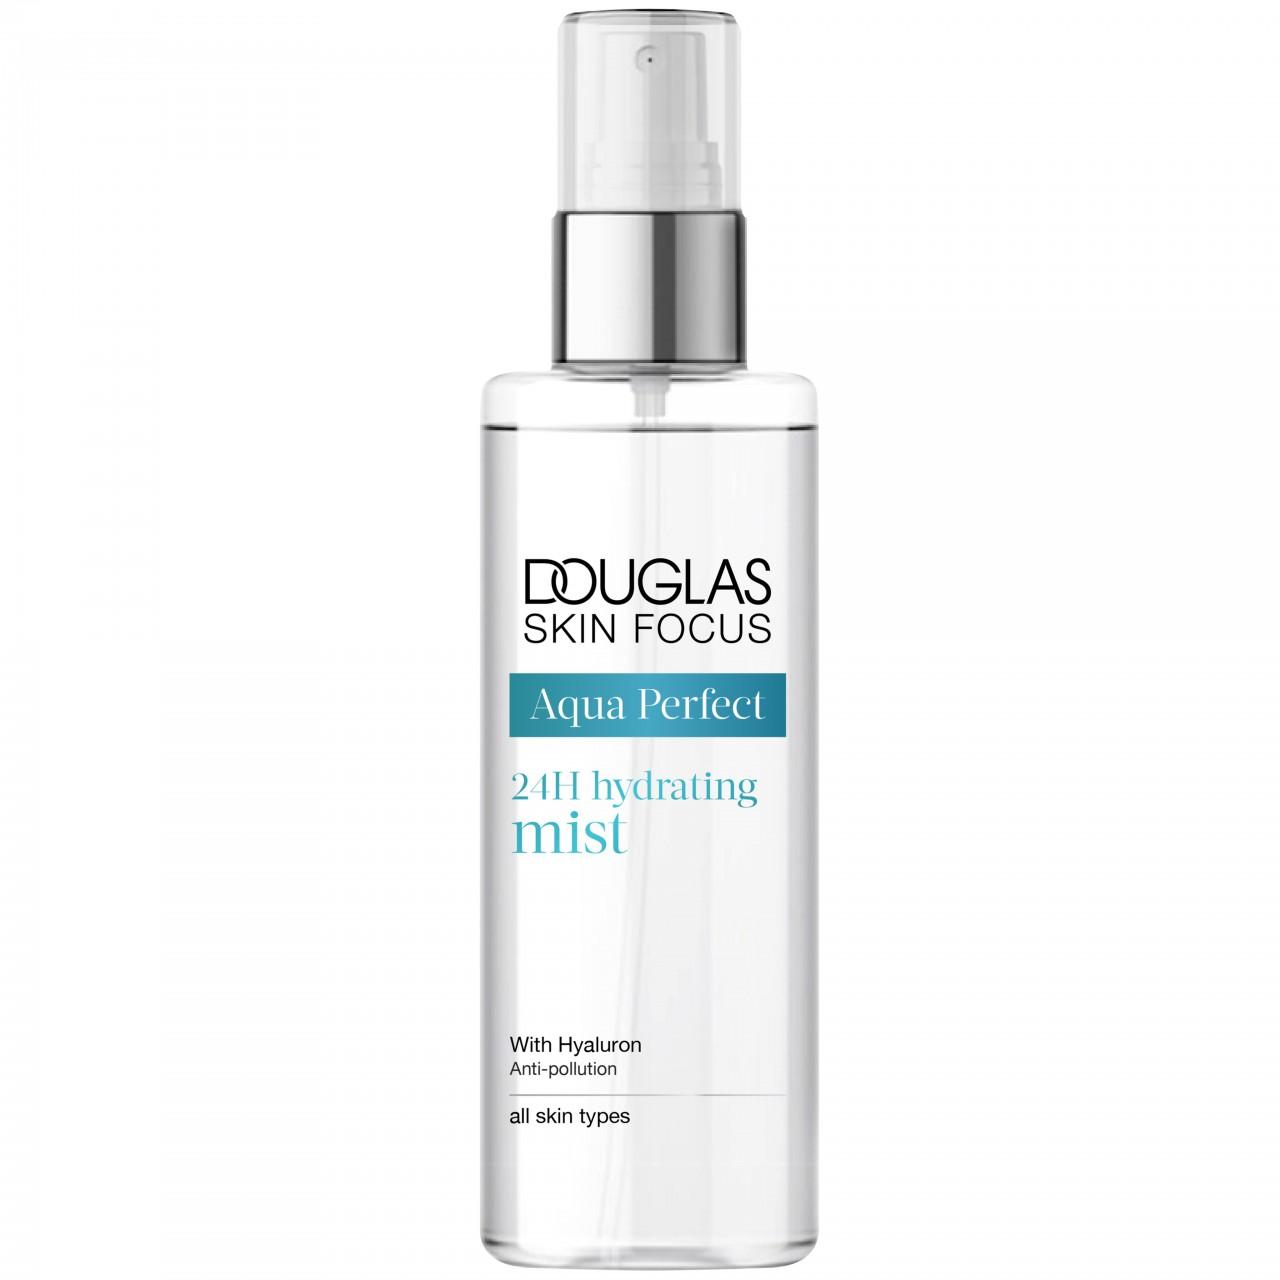 Douglas Focus 24H Hydrating Mist